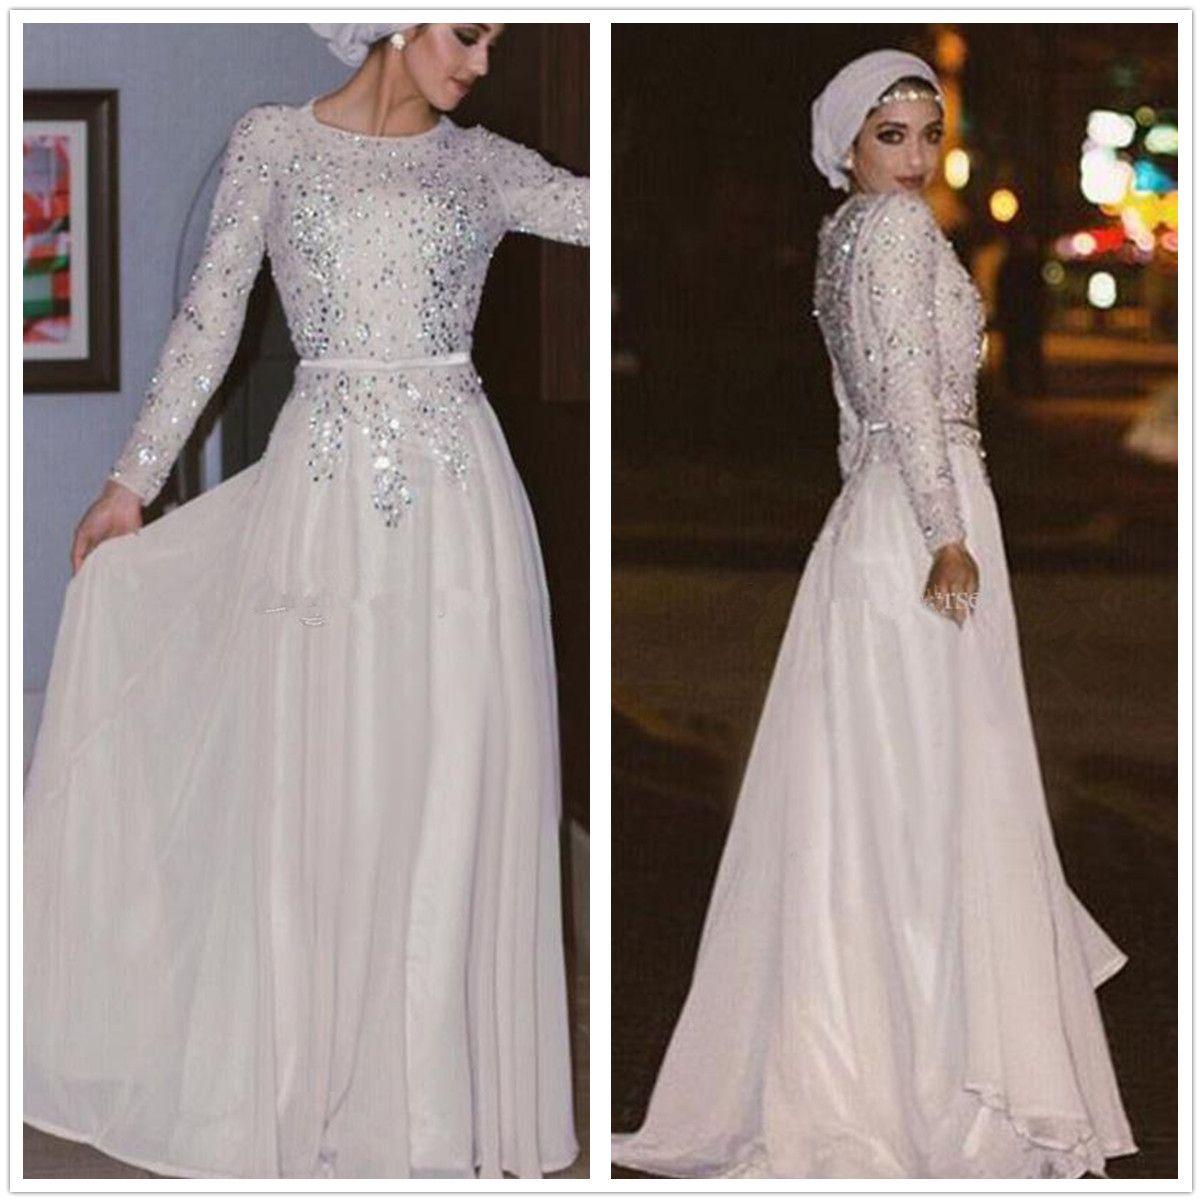 White Long Sleeve Chiffon Cocktail Dresses